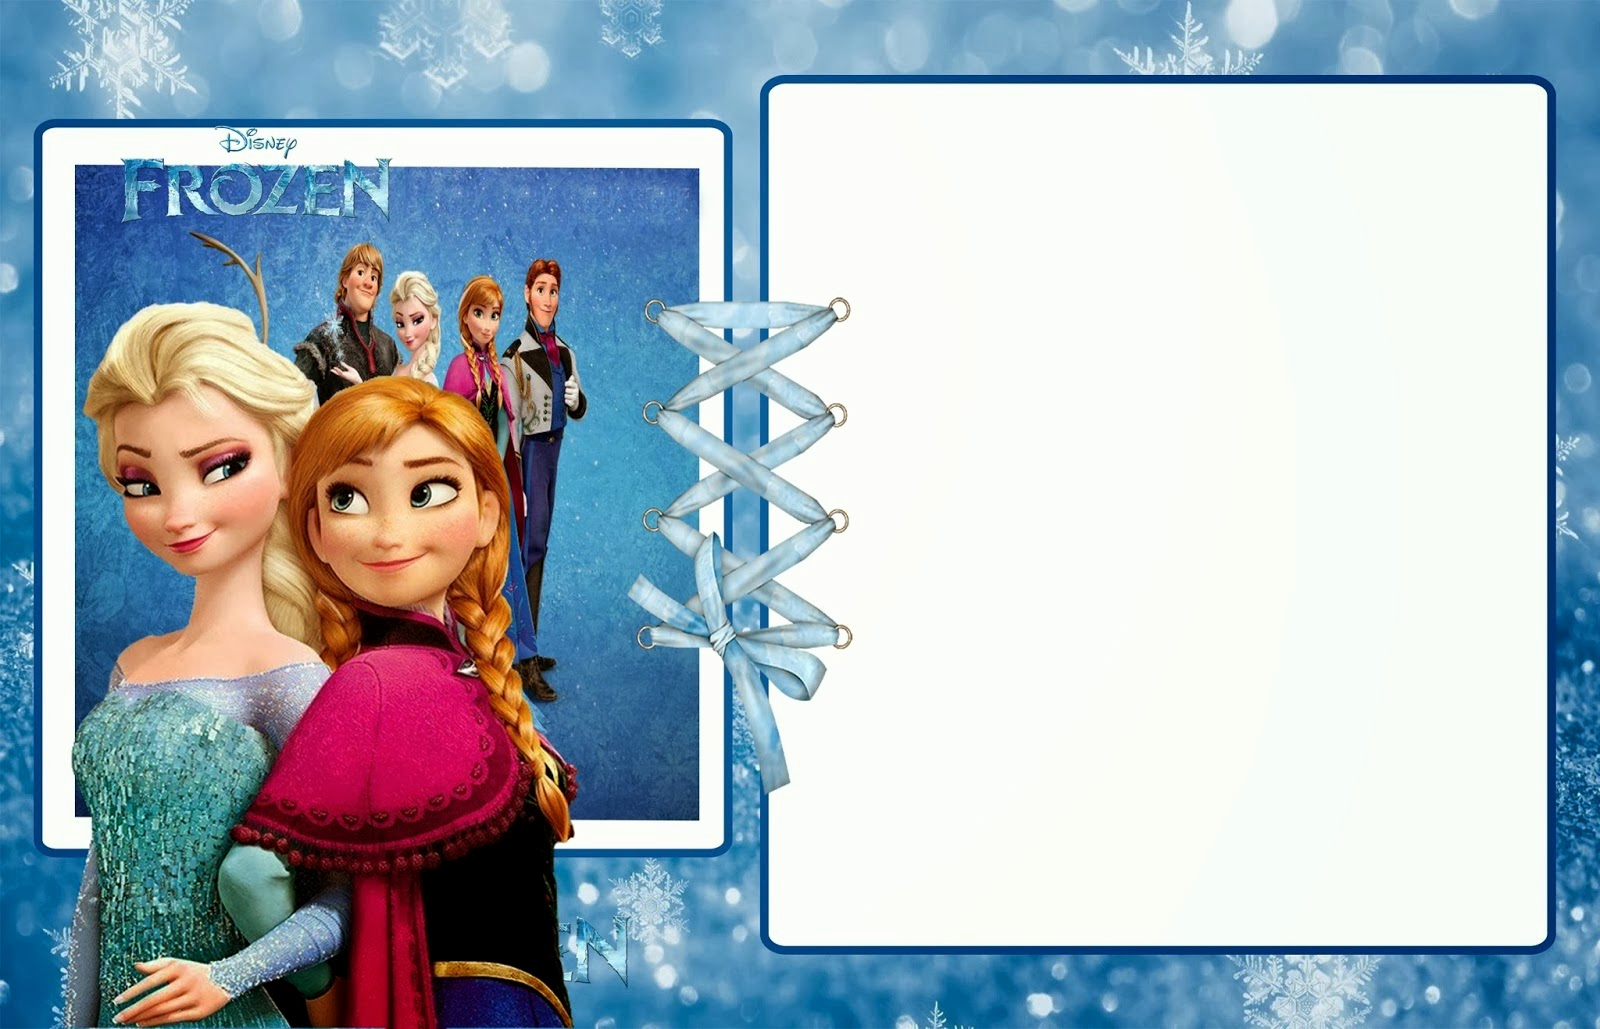 Free Printable Frozen Invitation Template Inspirational Frozen Party Free Printable Invitations